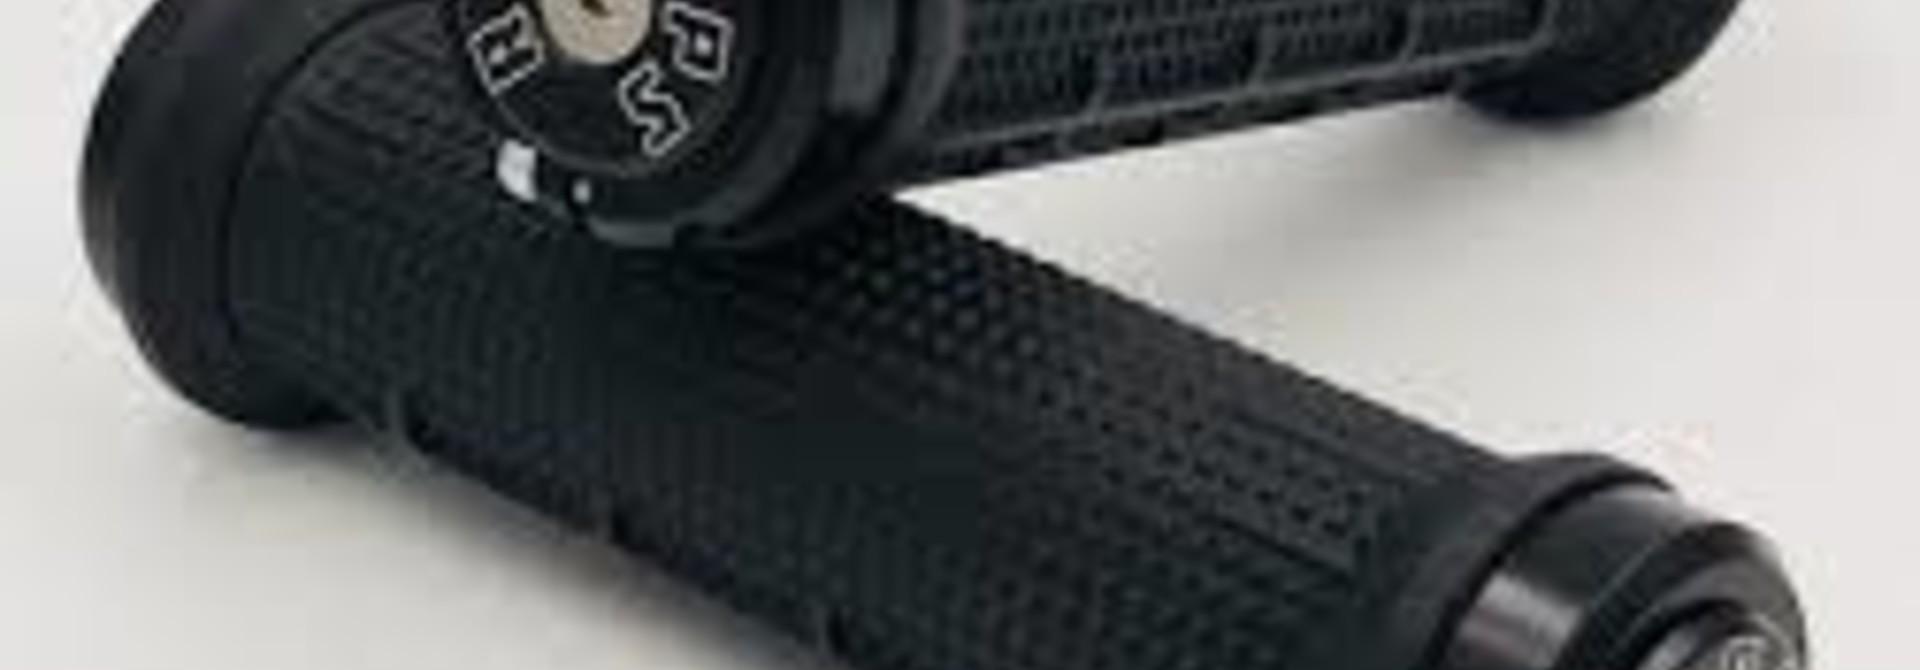 REV Grips - Race Series Shock Absorbing Grip System